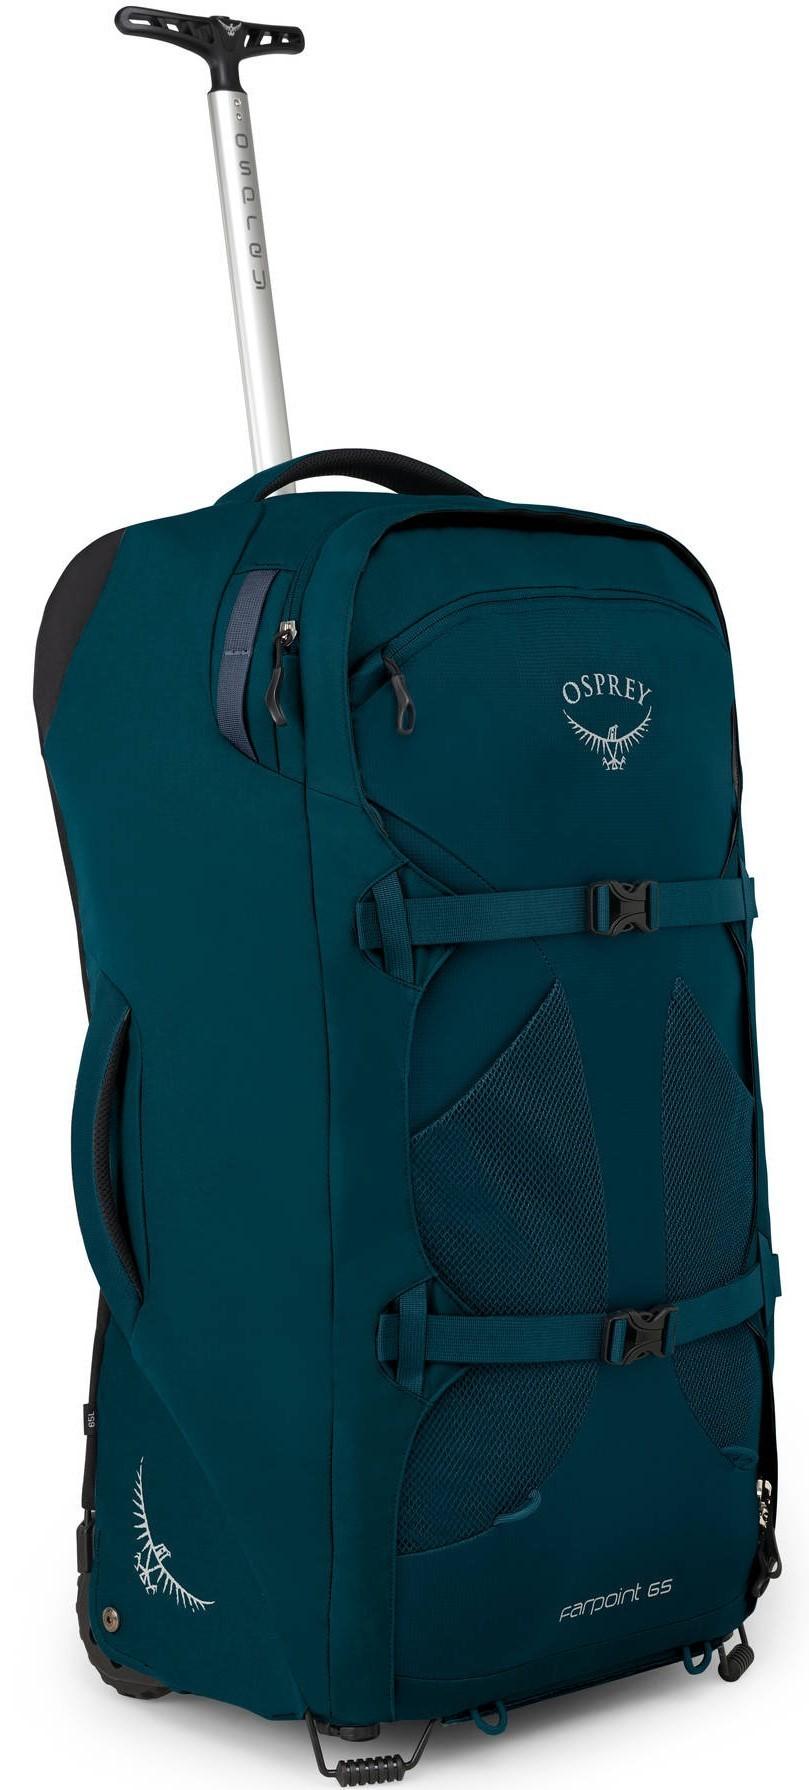 Сумки на колесах Сумка-рюкзак на колесах Osprey Farpoint Wheels 65, Petrol Blue Farpoint_Wheels_65_F19_Side_Petrol_Blue_web.jpg